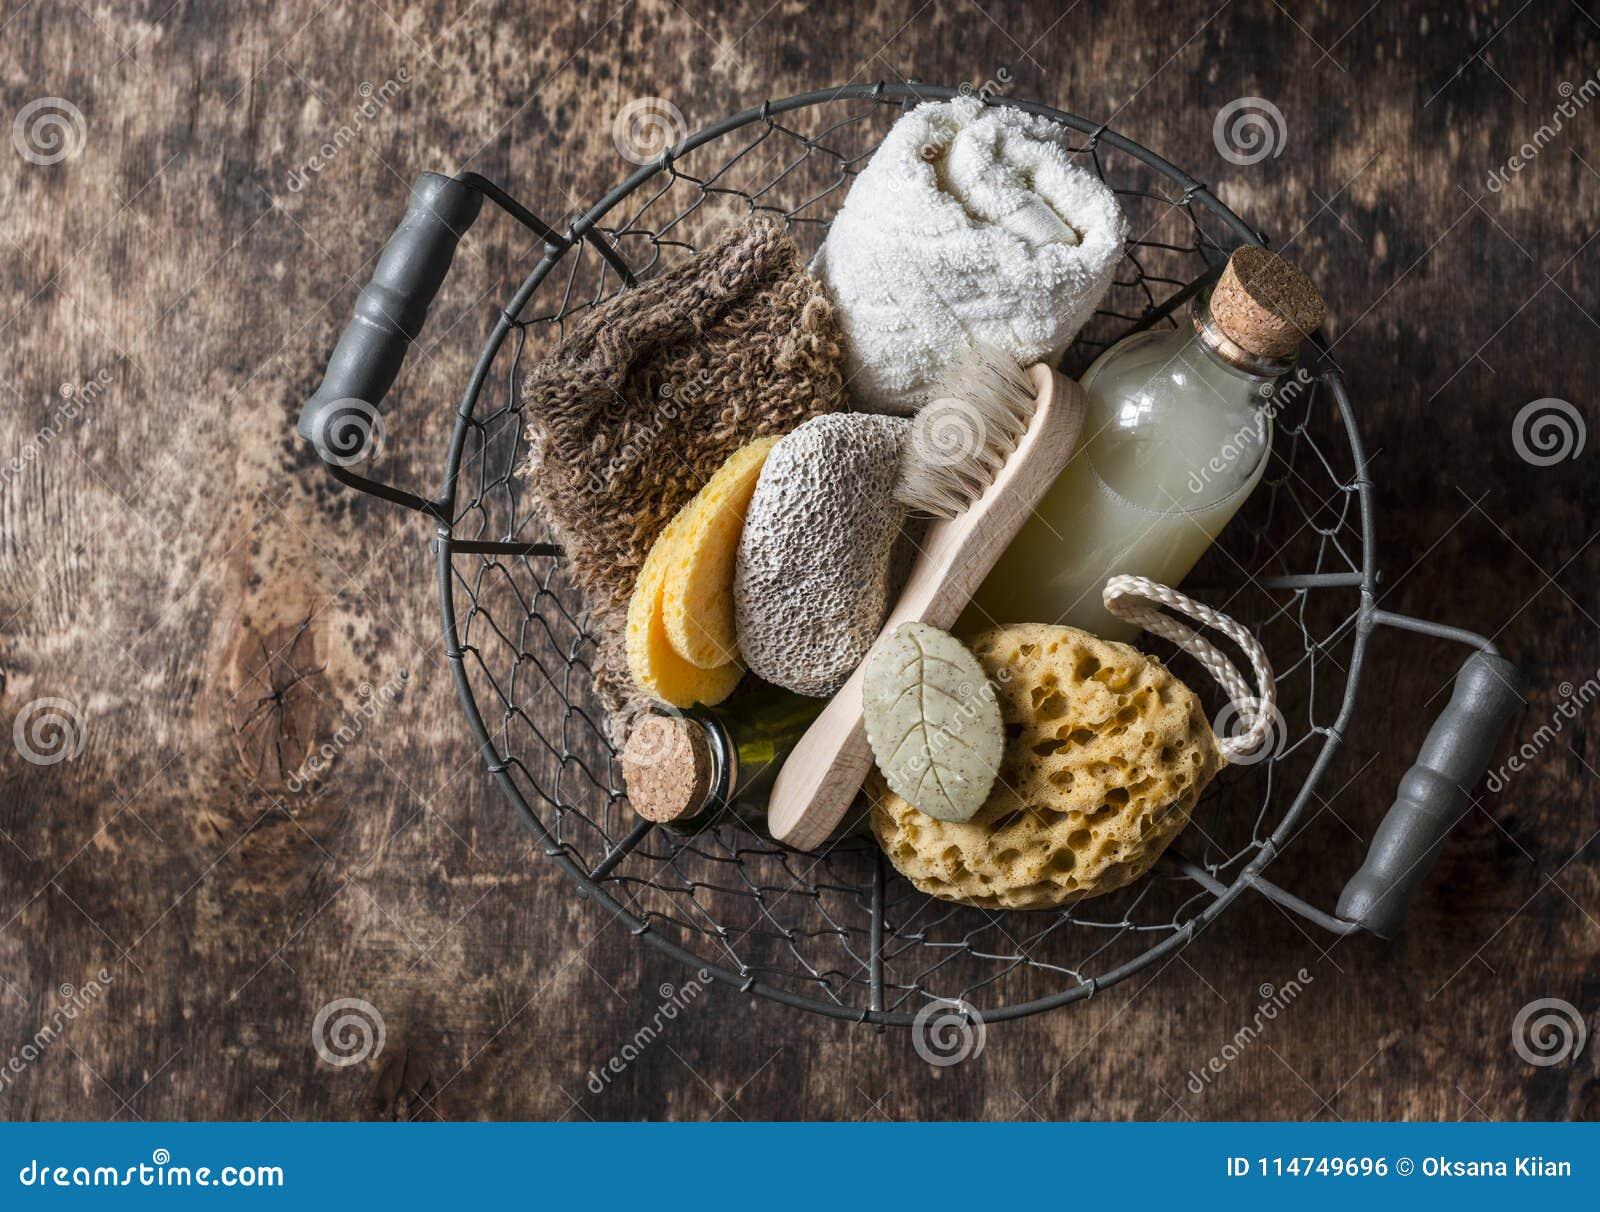 Shower accessories in vintage basket - shampoo, sponge, soap, facial brush, towel, washcloth, pumice stone. Natural beauty care pr